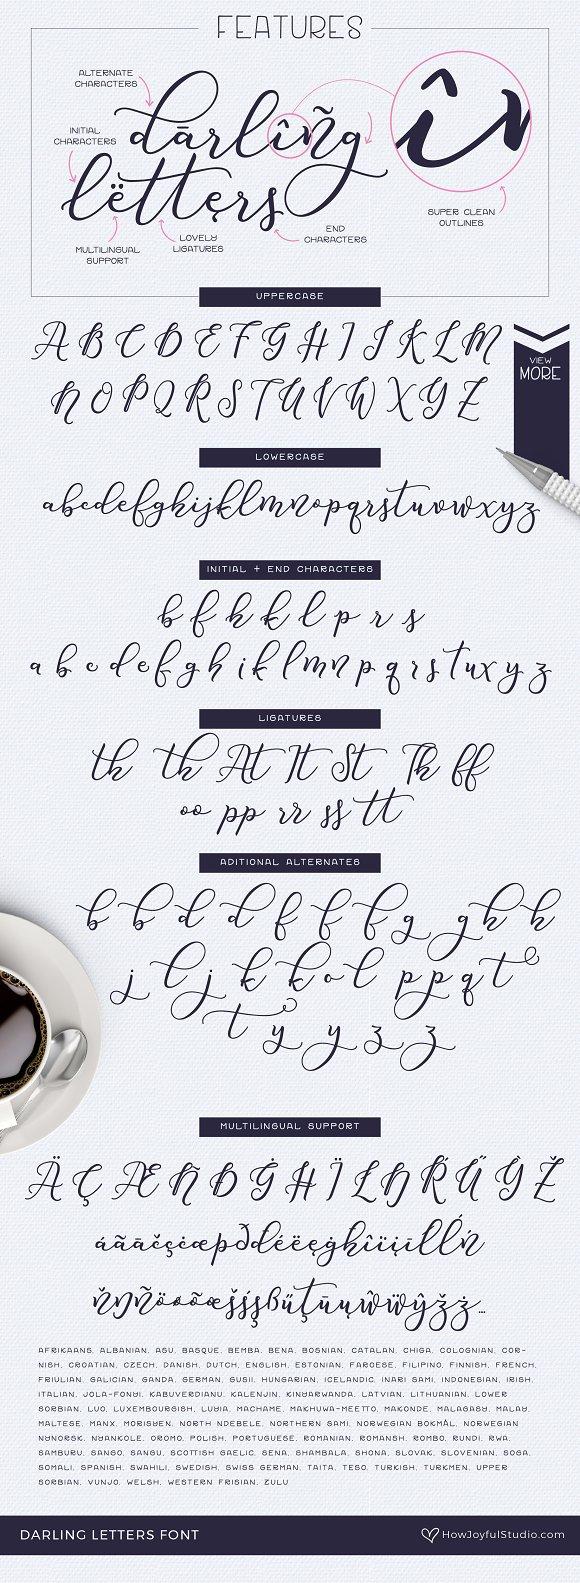 Darling Letters Font Script Fonts Creative Market